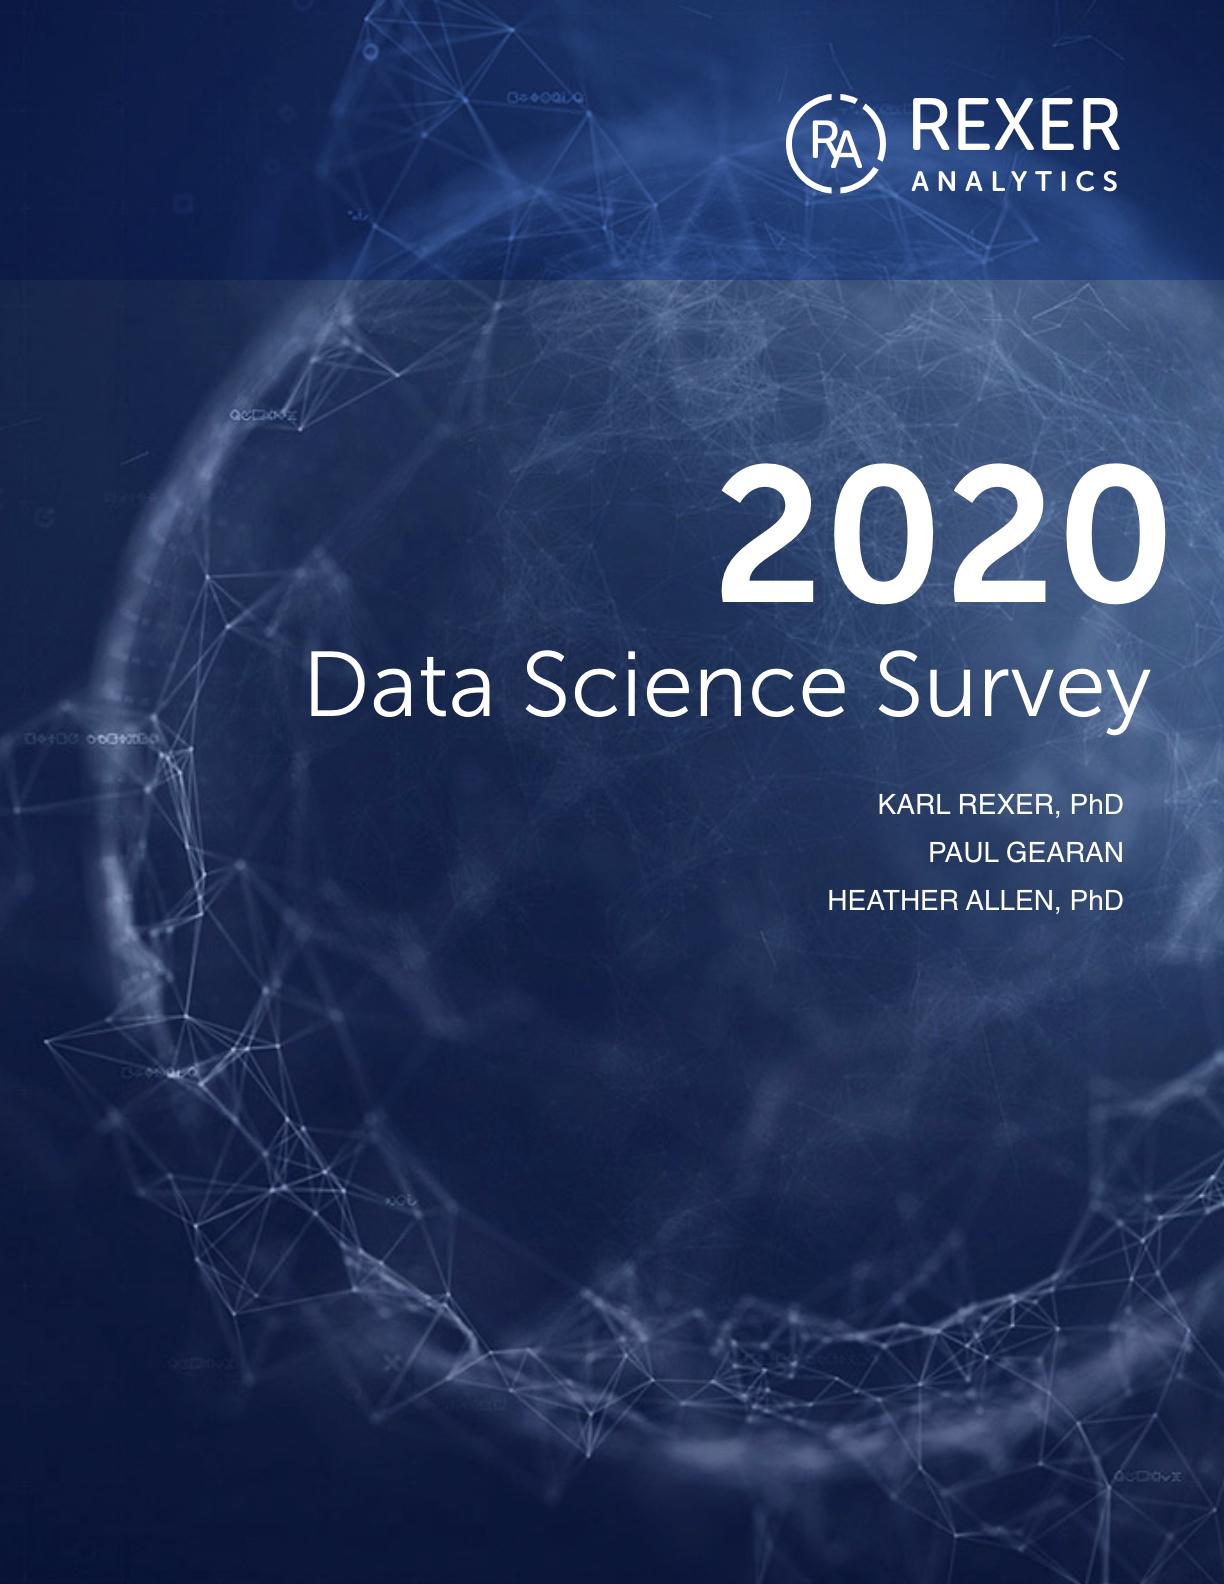 2020 data science survey